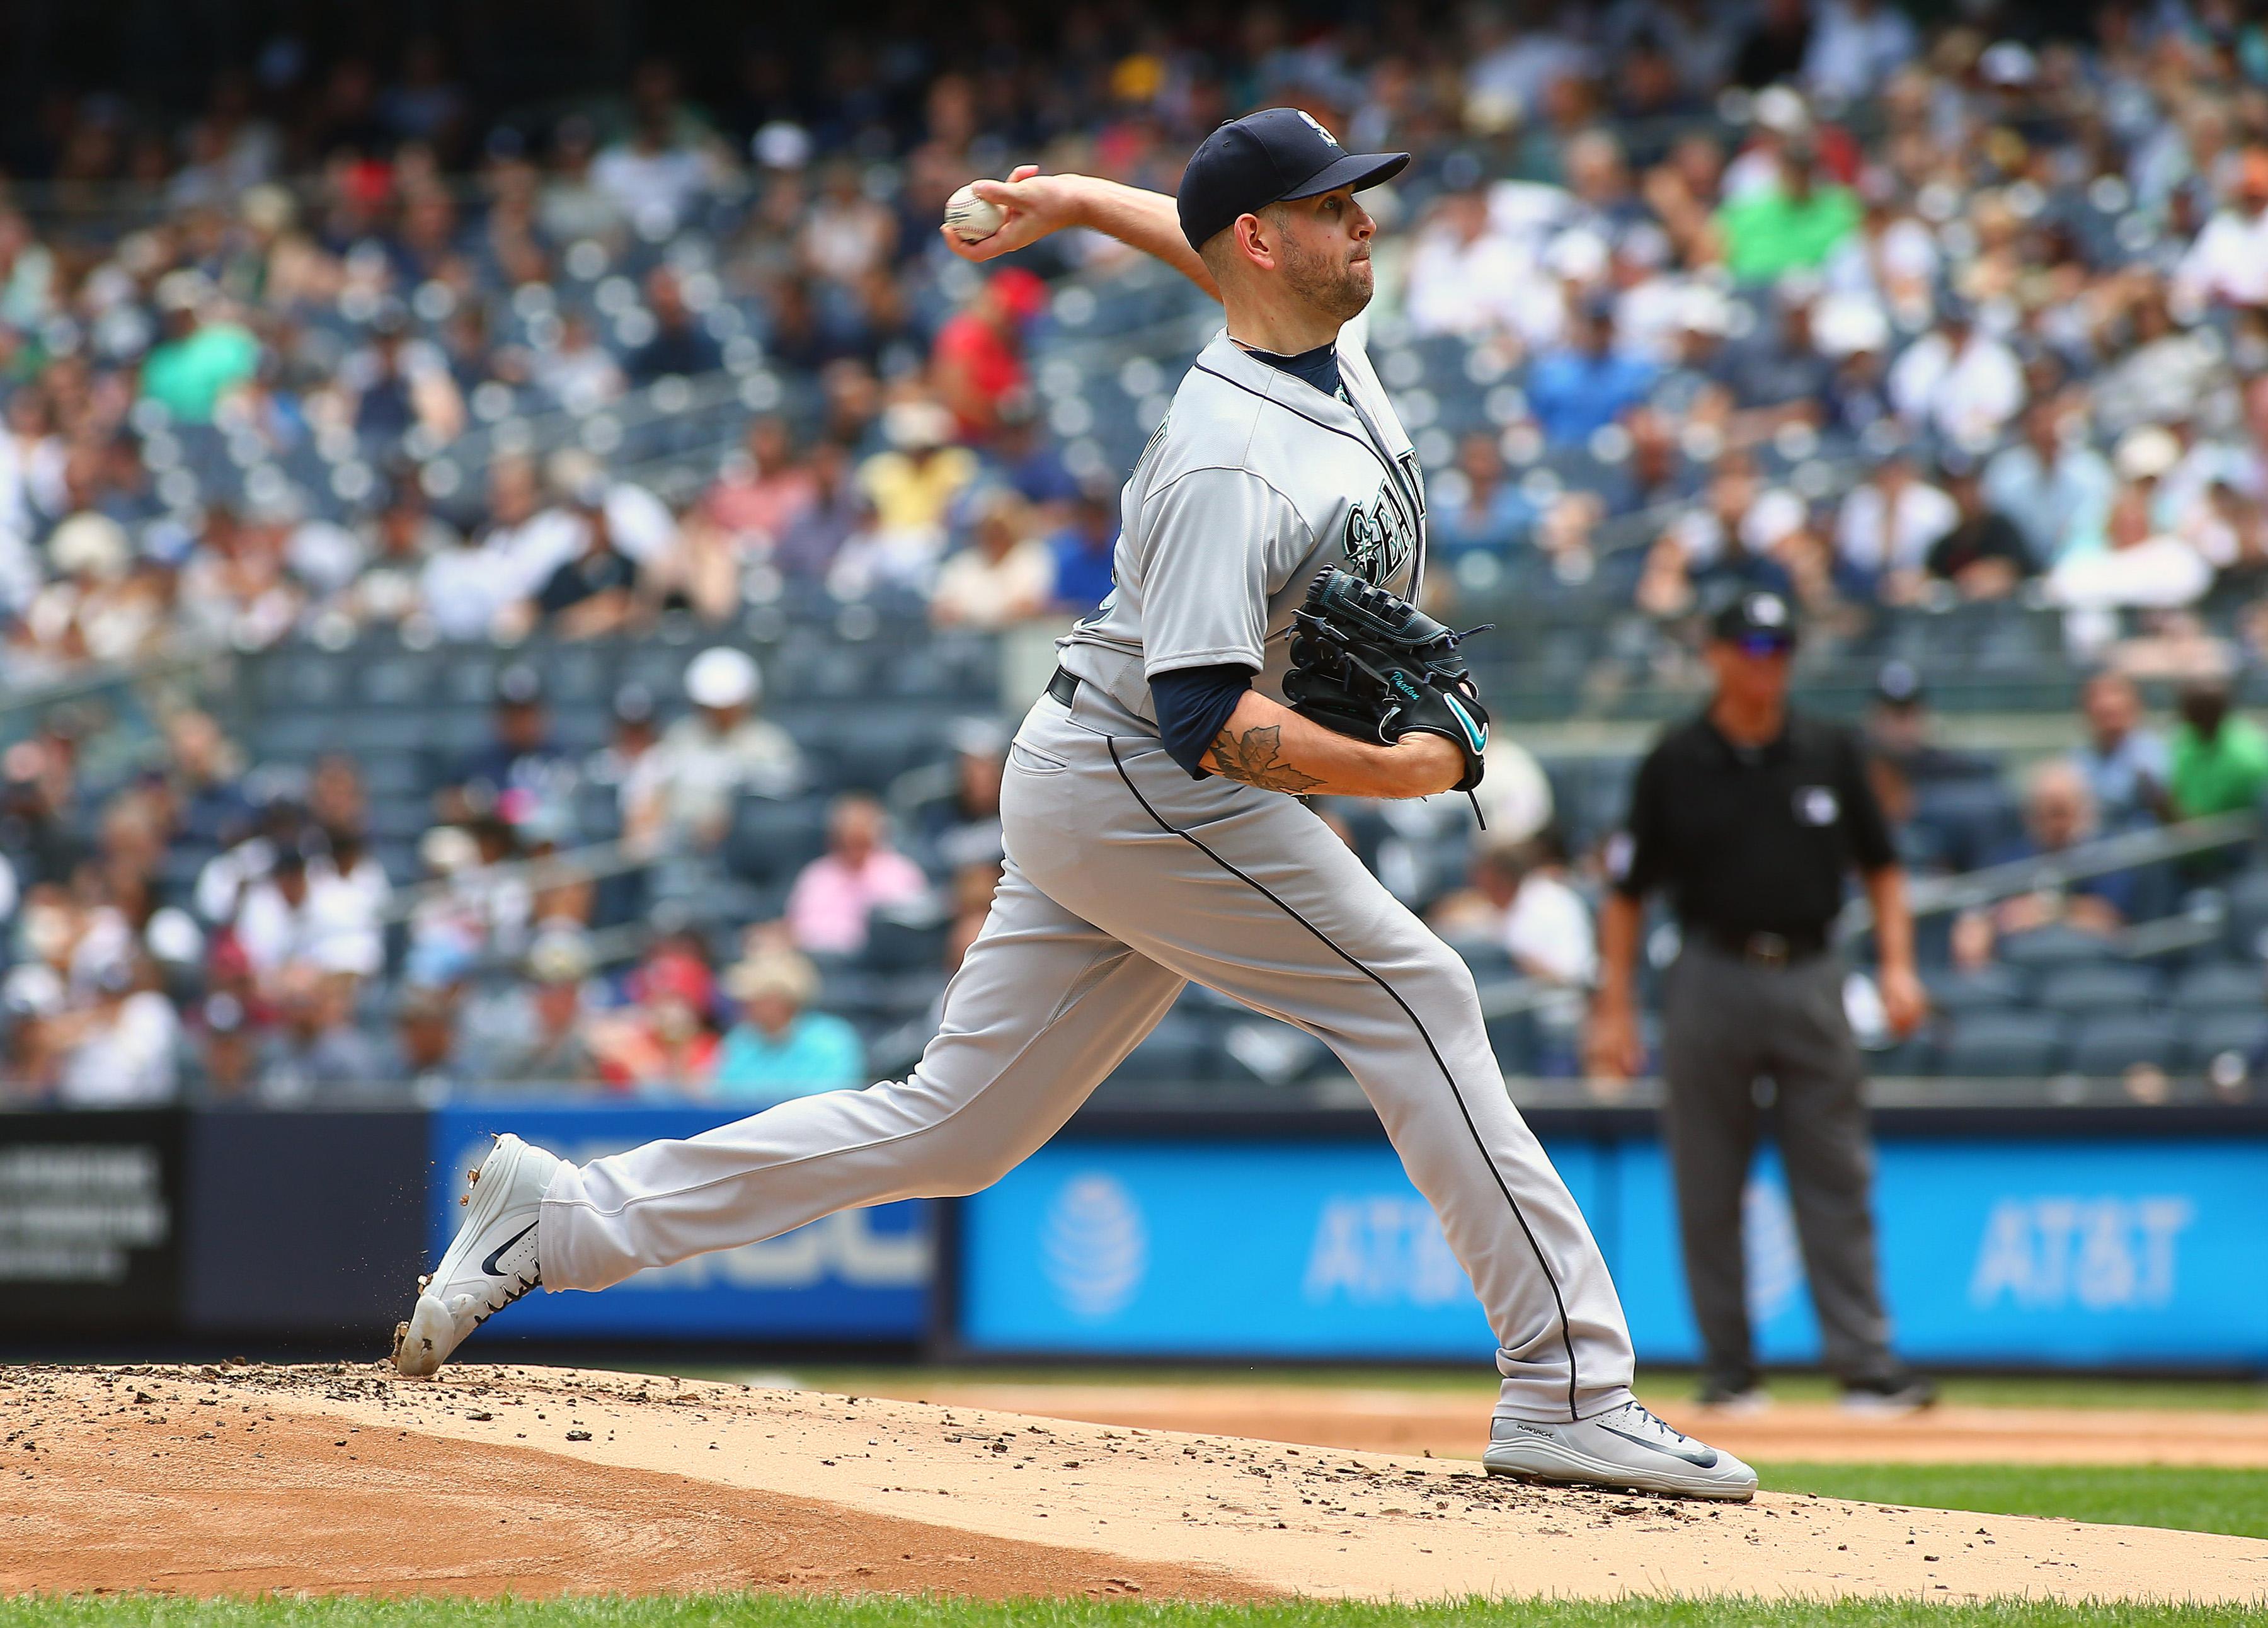 MLB: Seattle Mariners at New York Yankees